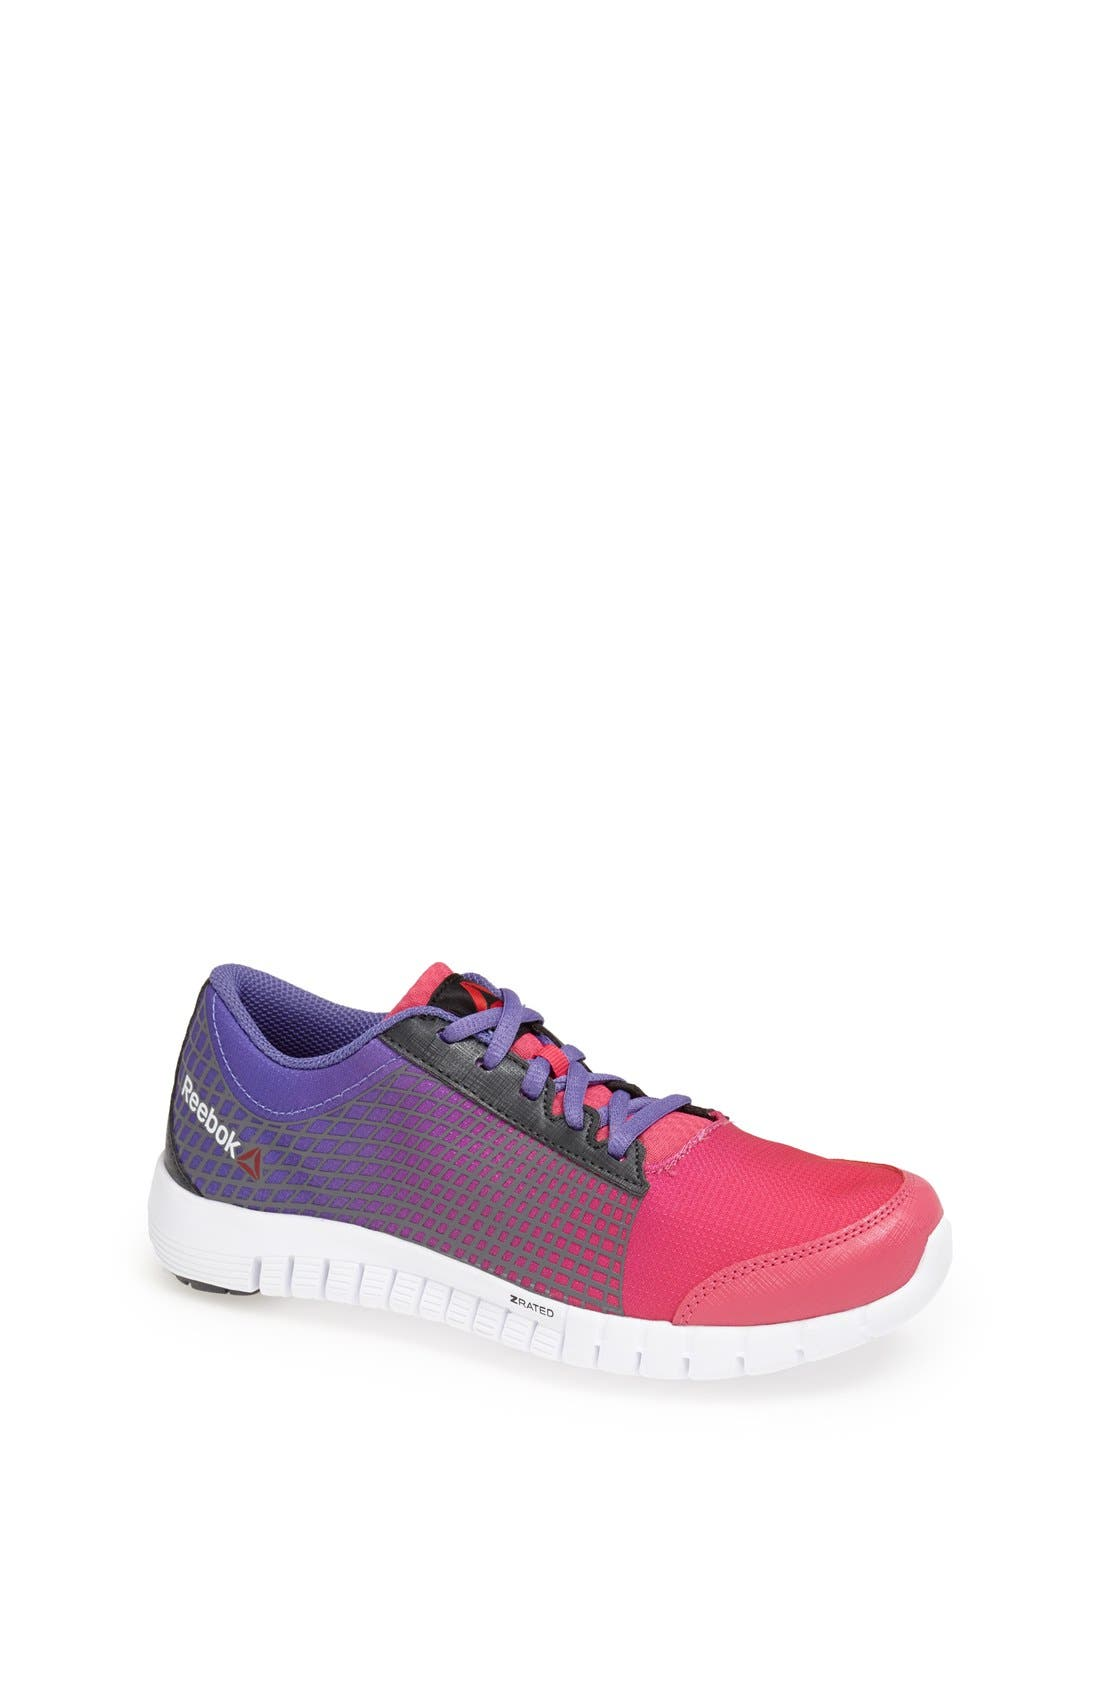 Main Image - Reebok 'ZQuick' Sneaker (Big Kid)